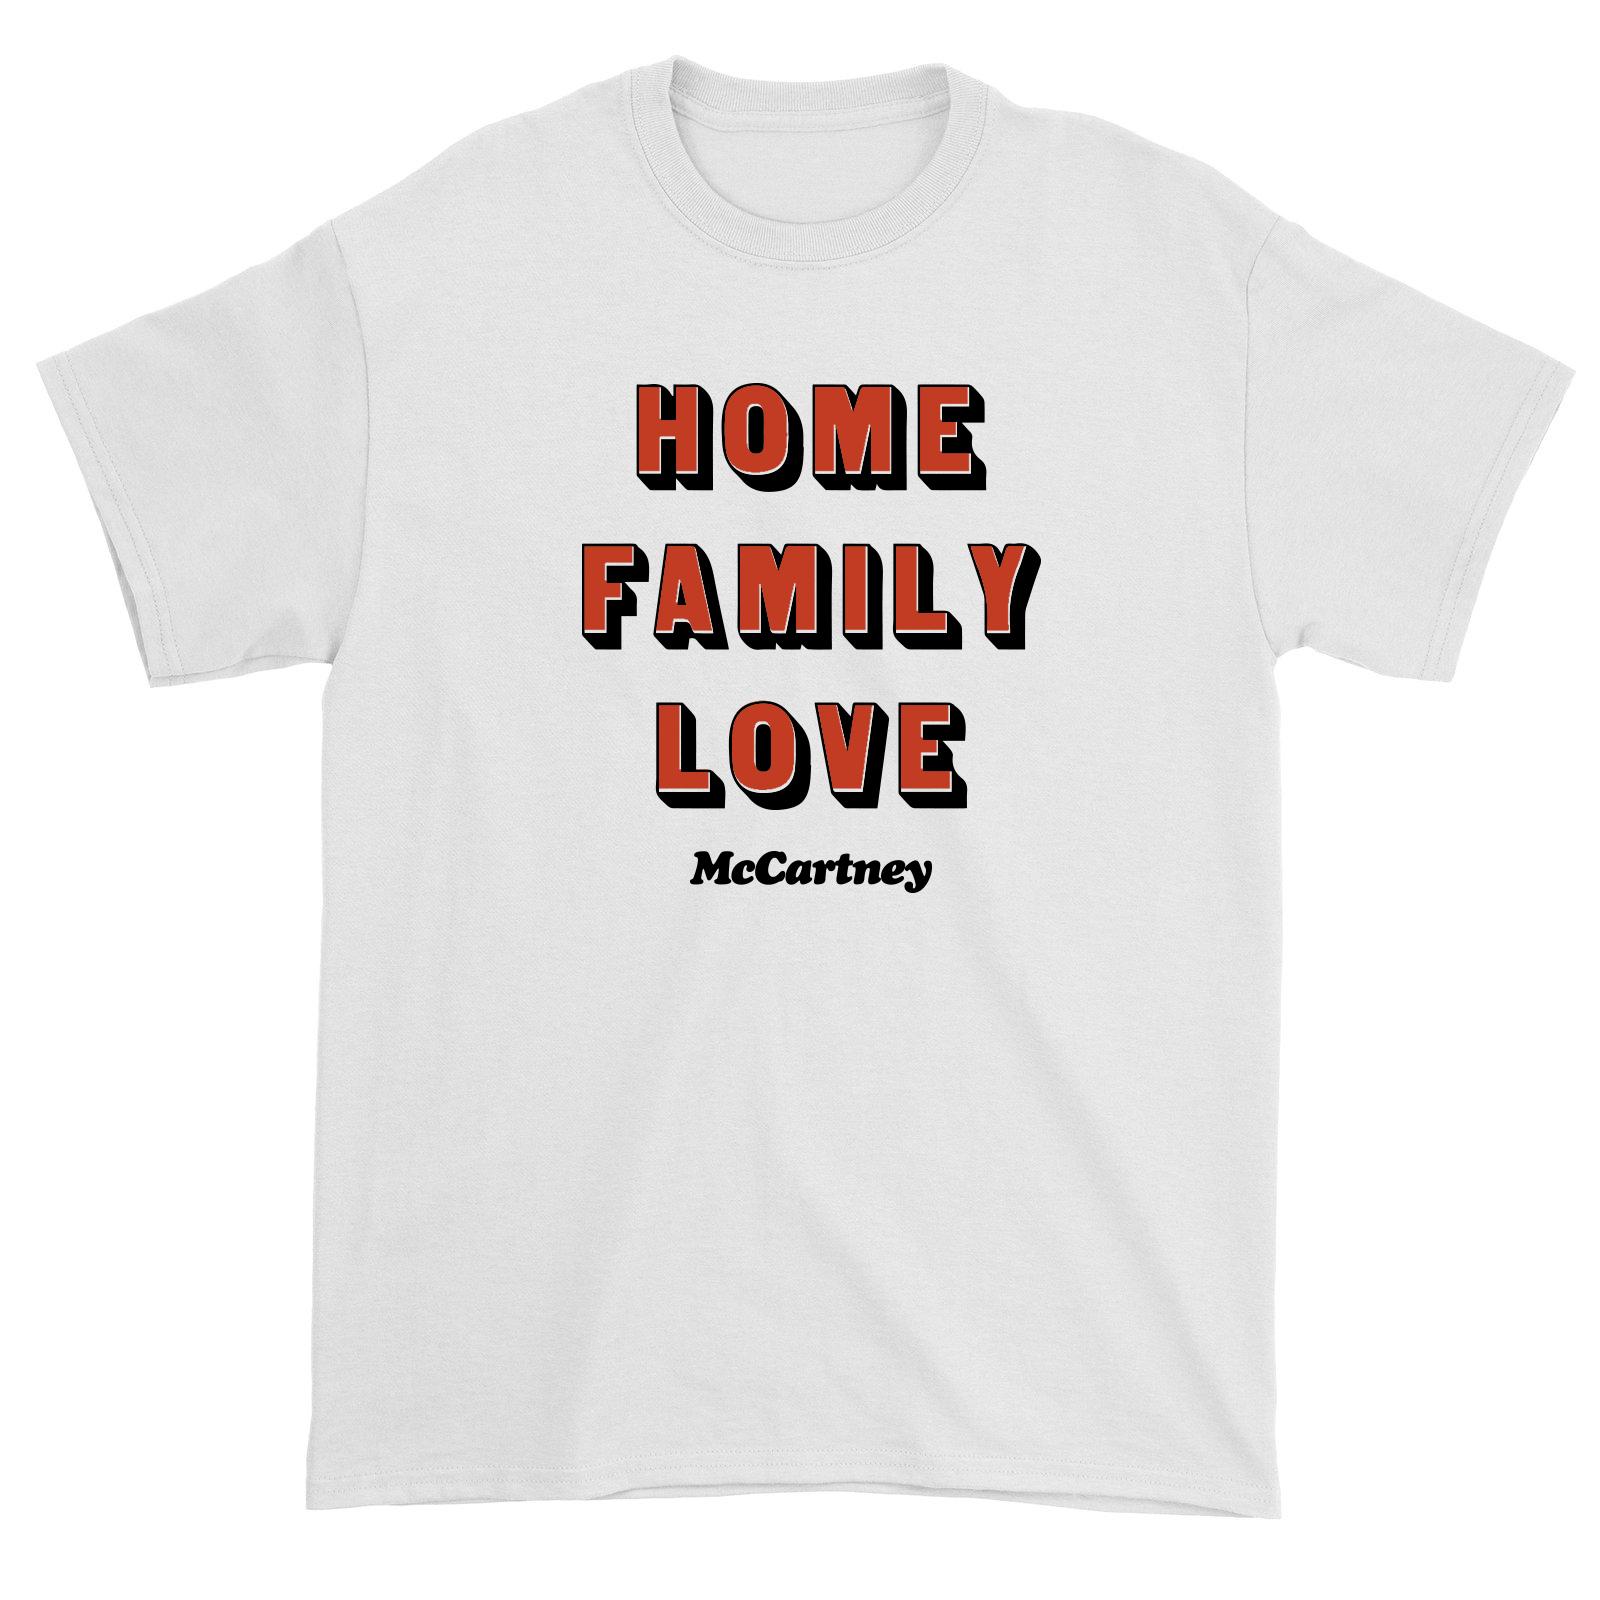 Home Family Love Tee